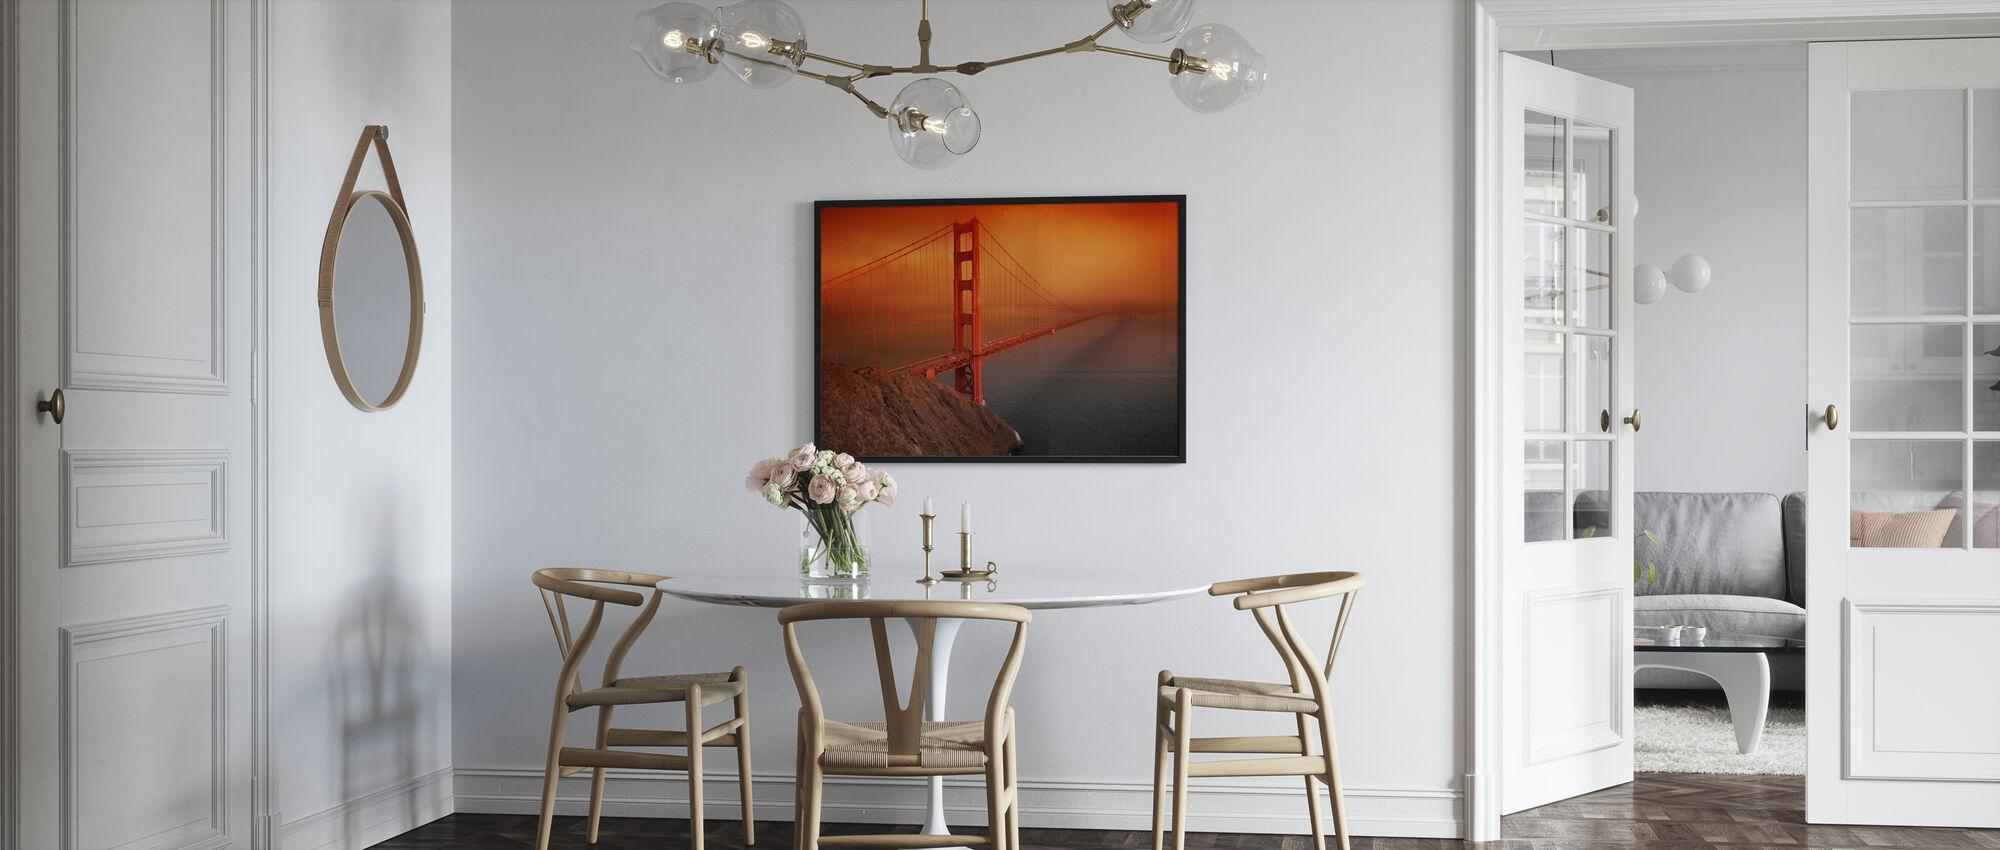 Golden Gate - Framed print - Kitchen